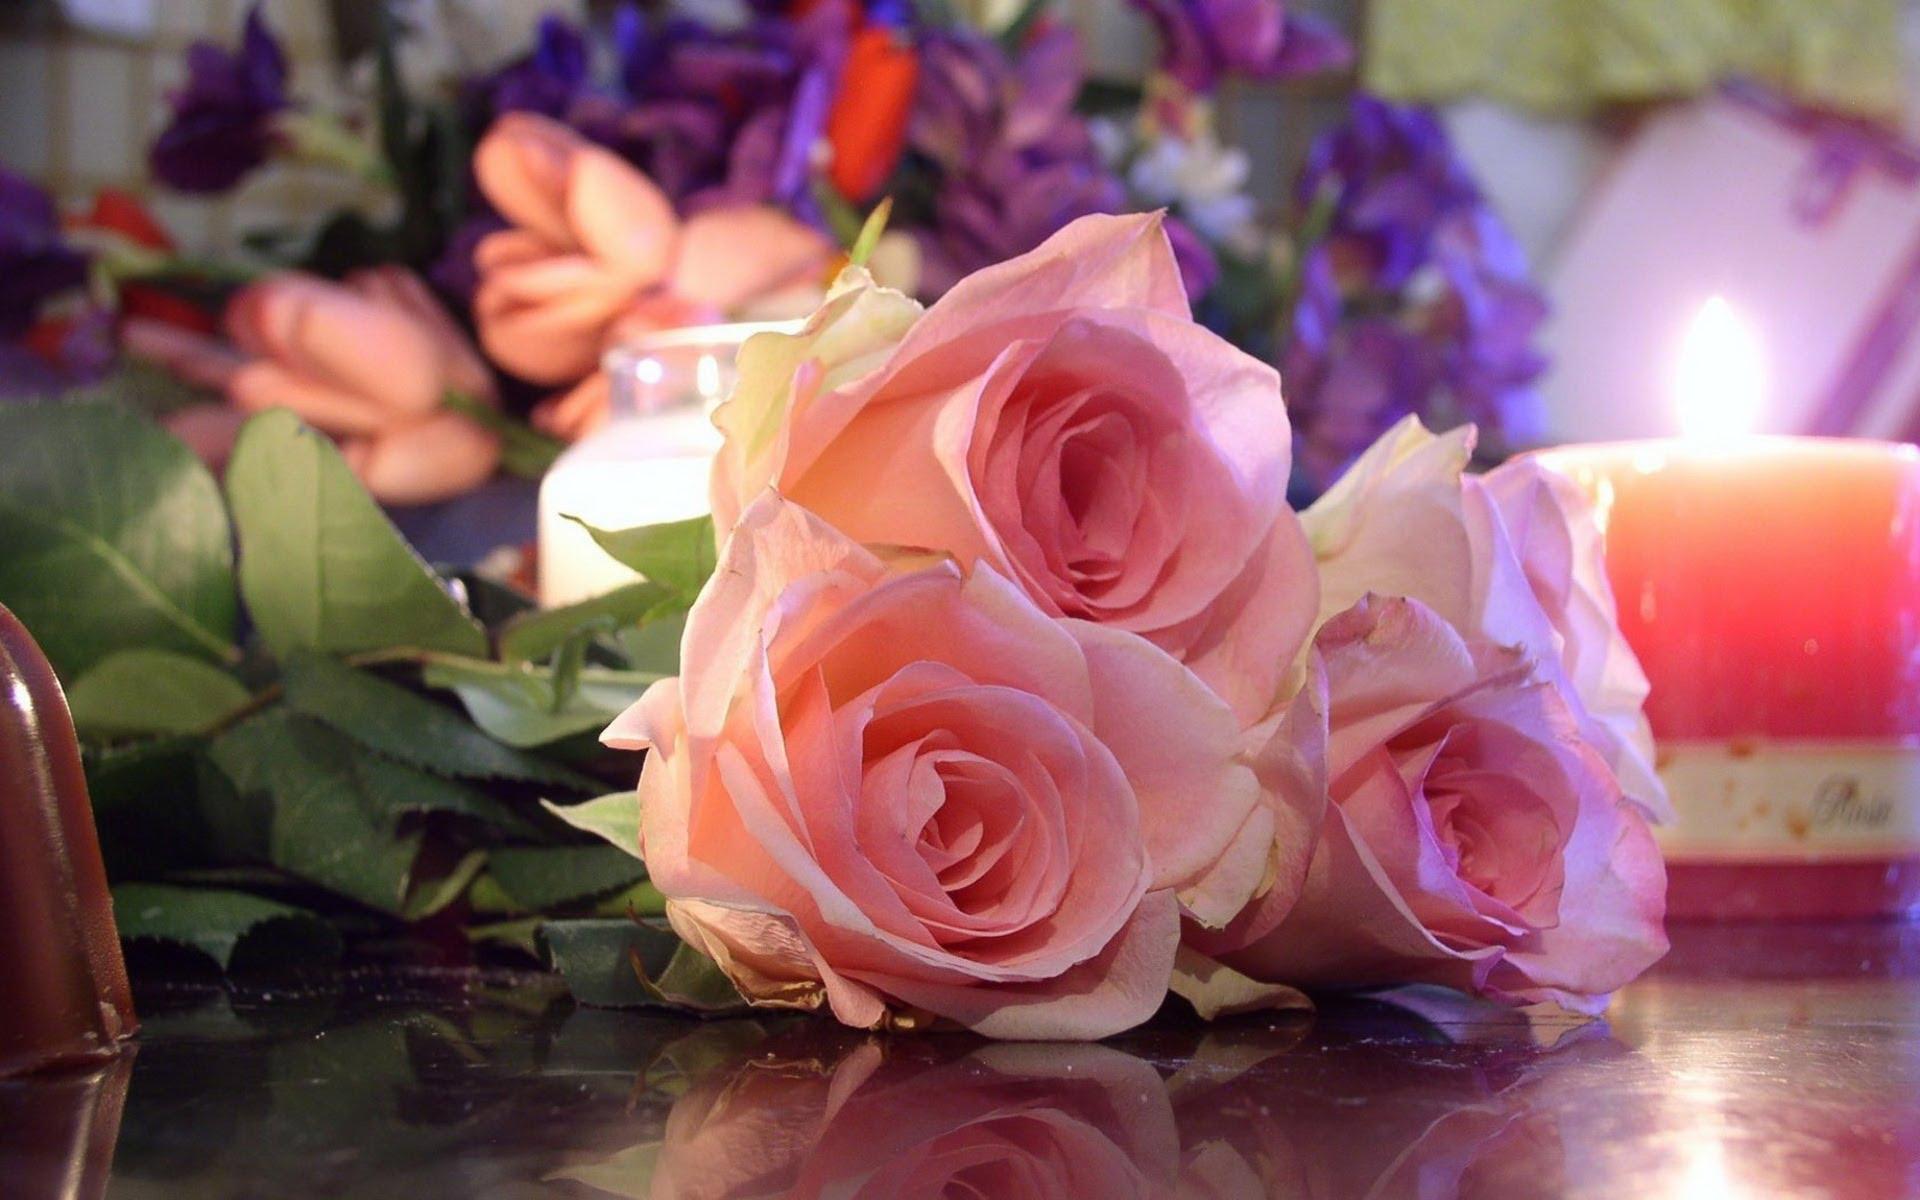 صوره صور ورود حلوه , اروع صور الورود للعشاق